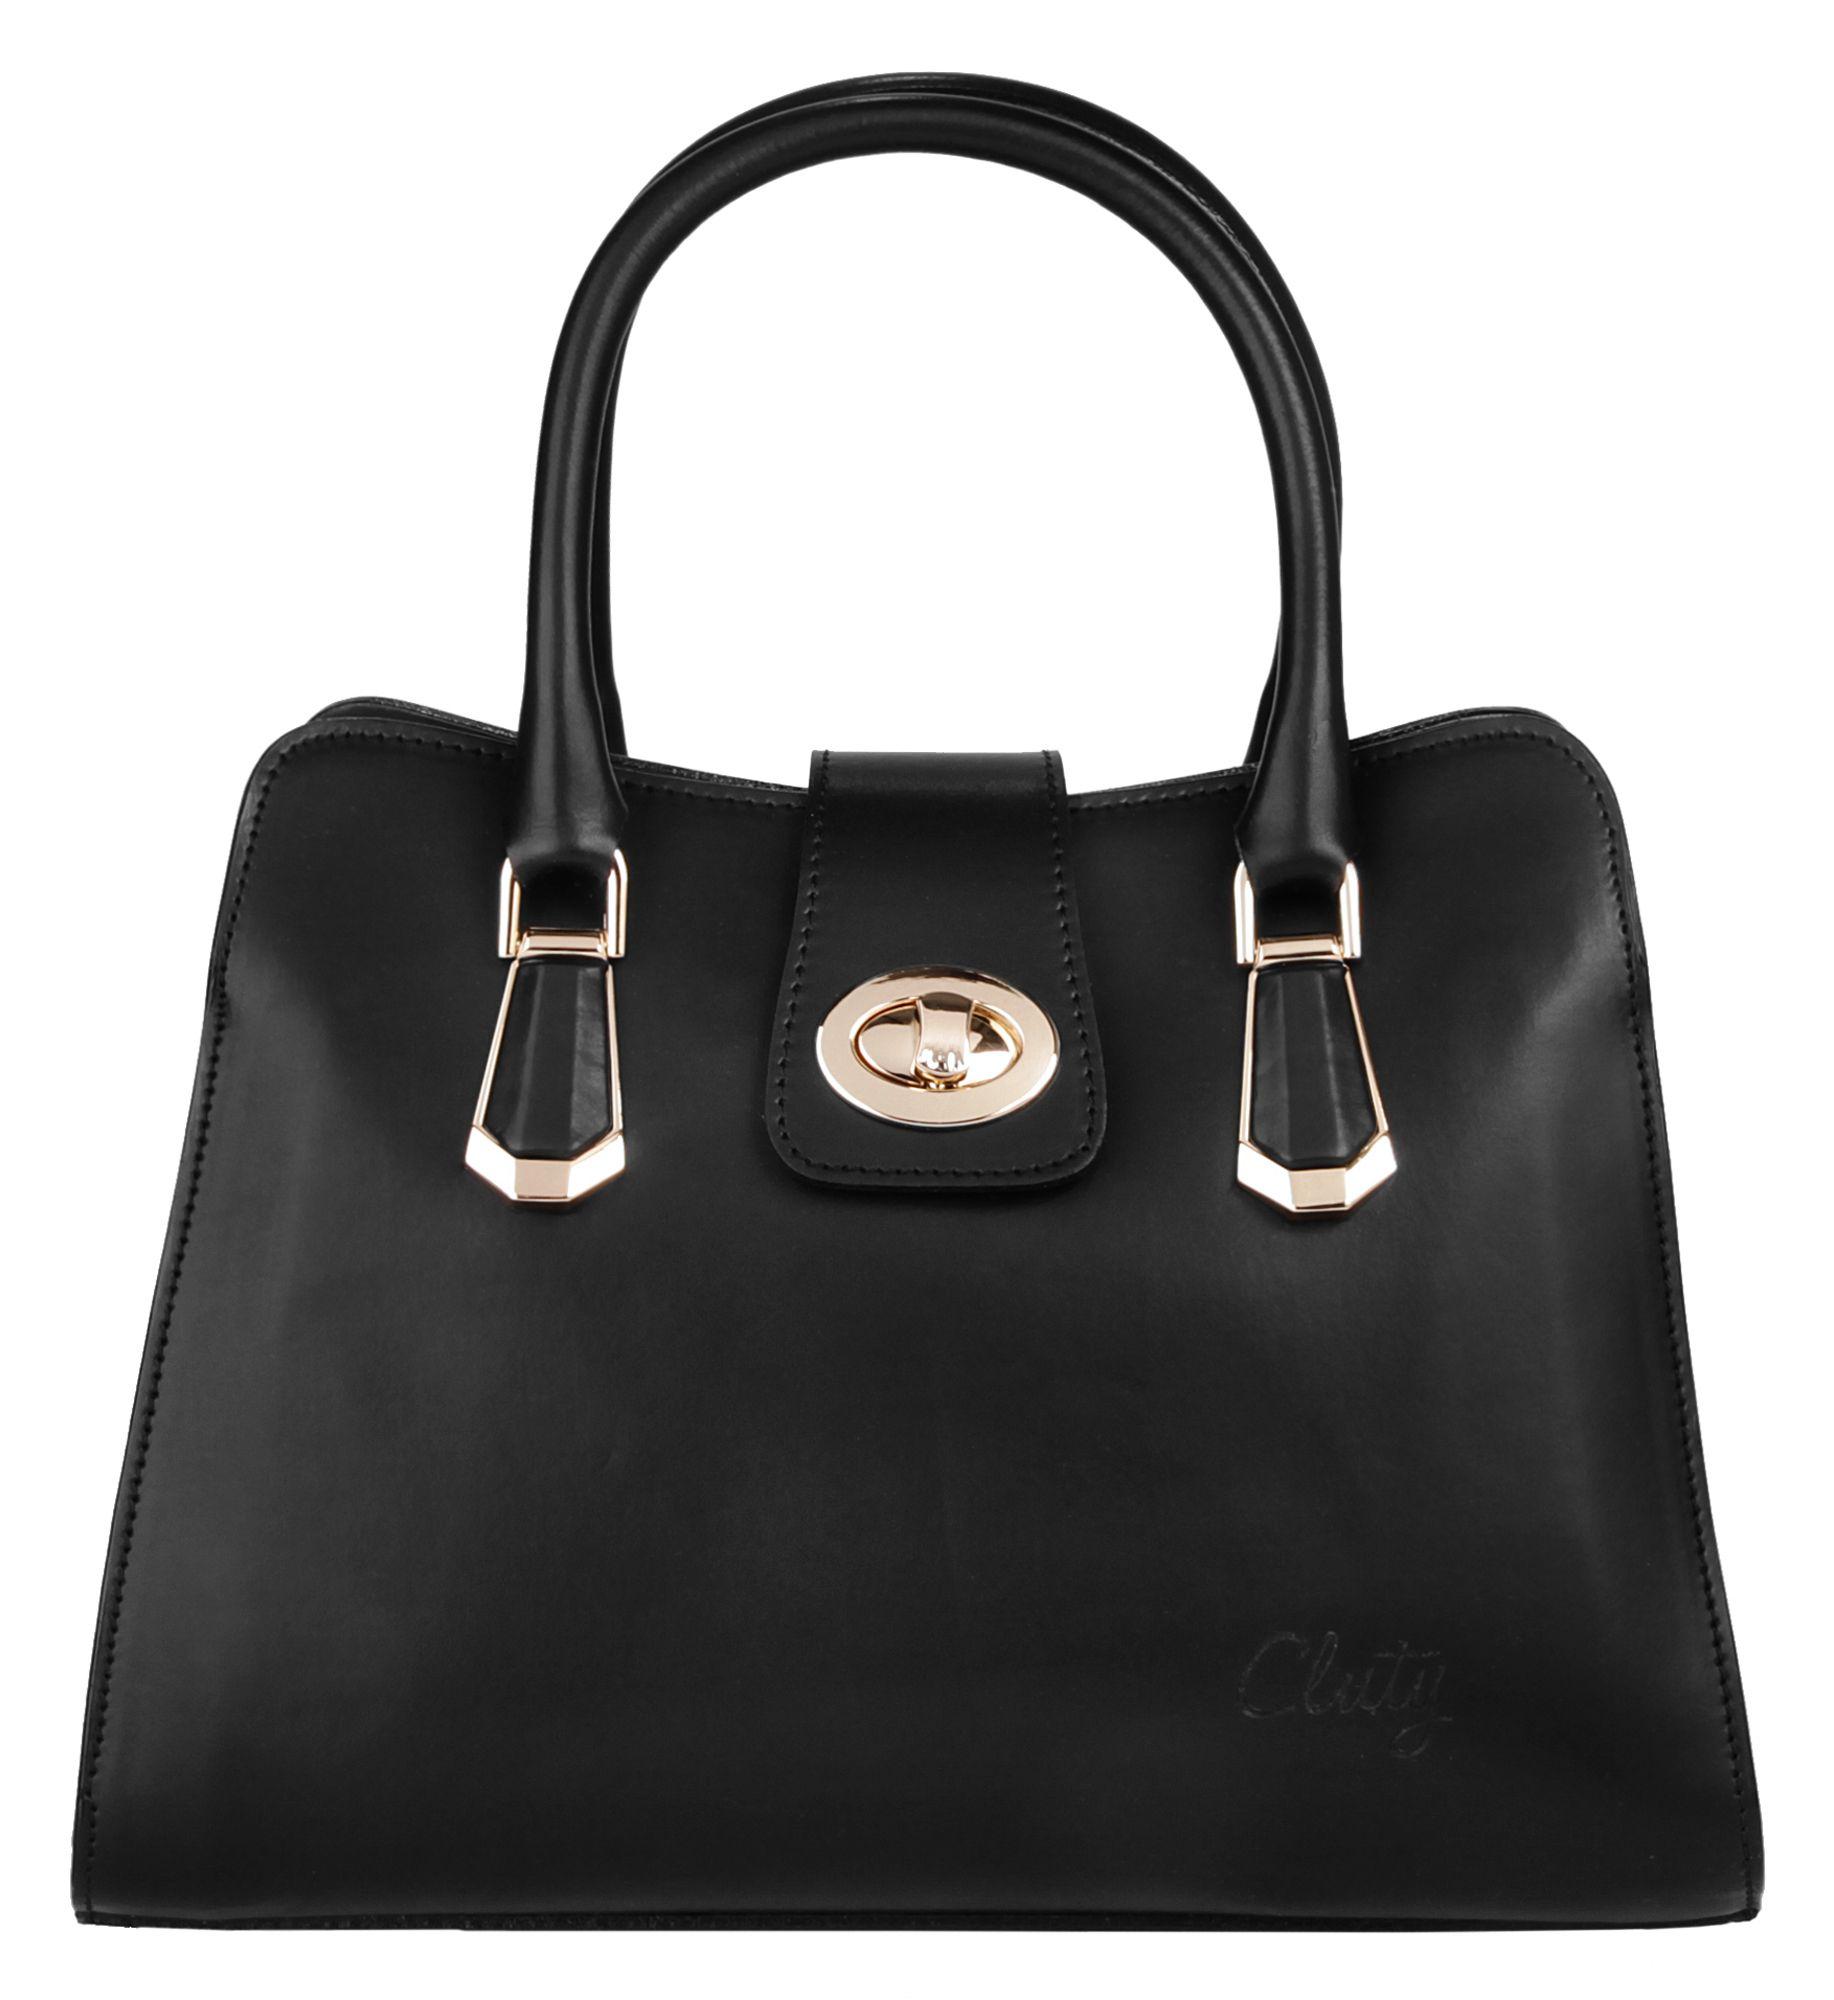 CLUTY Cluty Leder Damen Handtasche